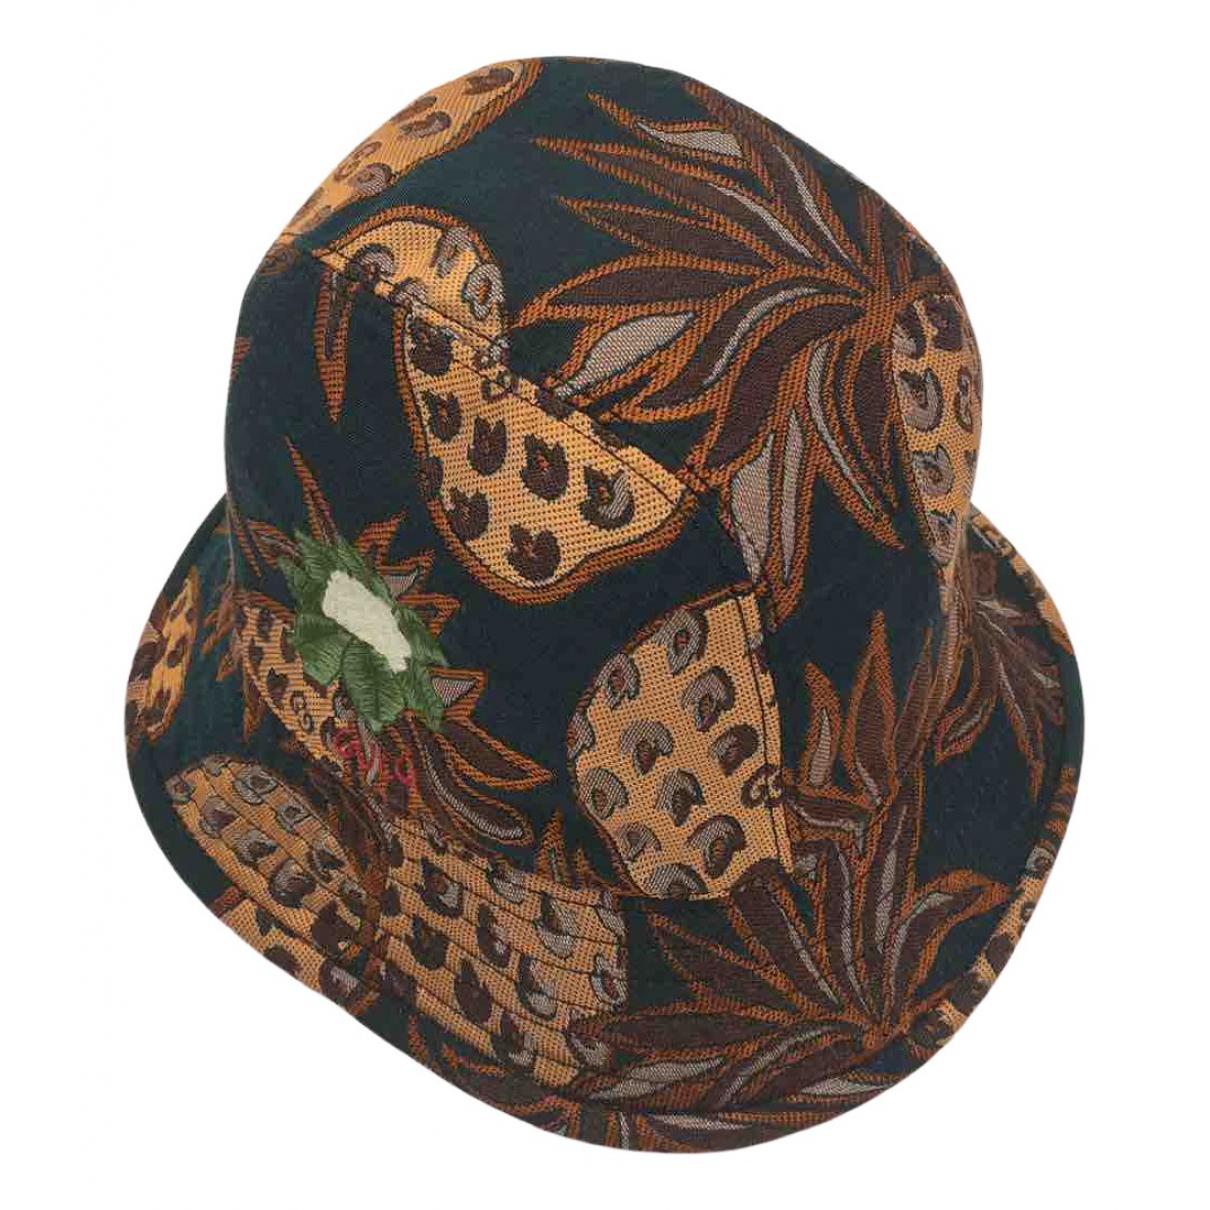 Gucci \N Brown Cloth hat for Women M International